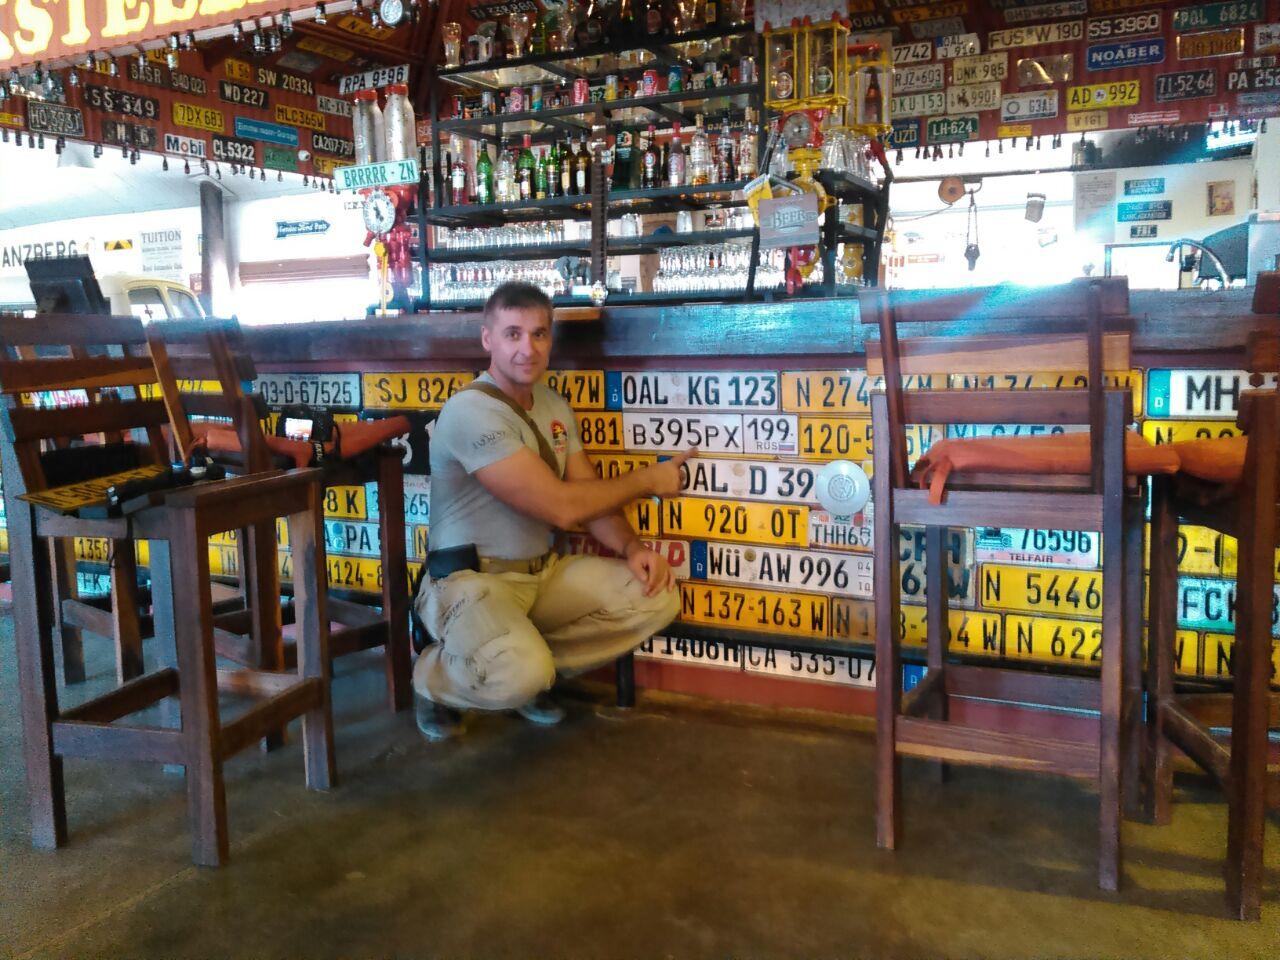 Роад Хаус (отель, бар, ресторан) AfroRally 2016